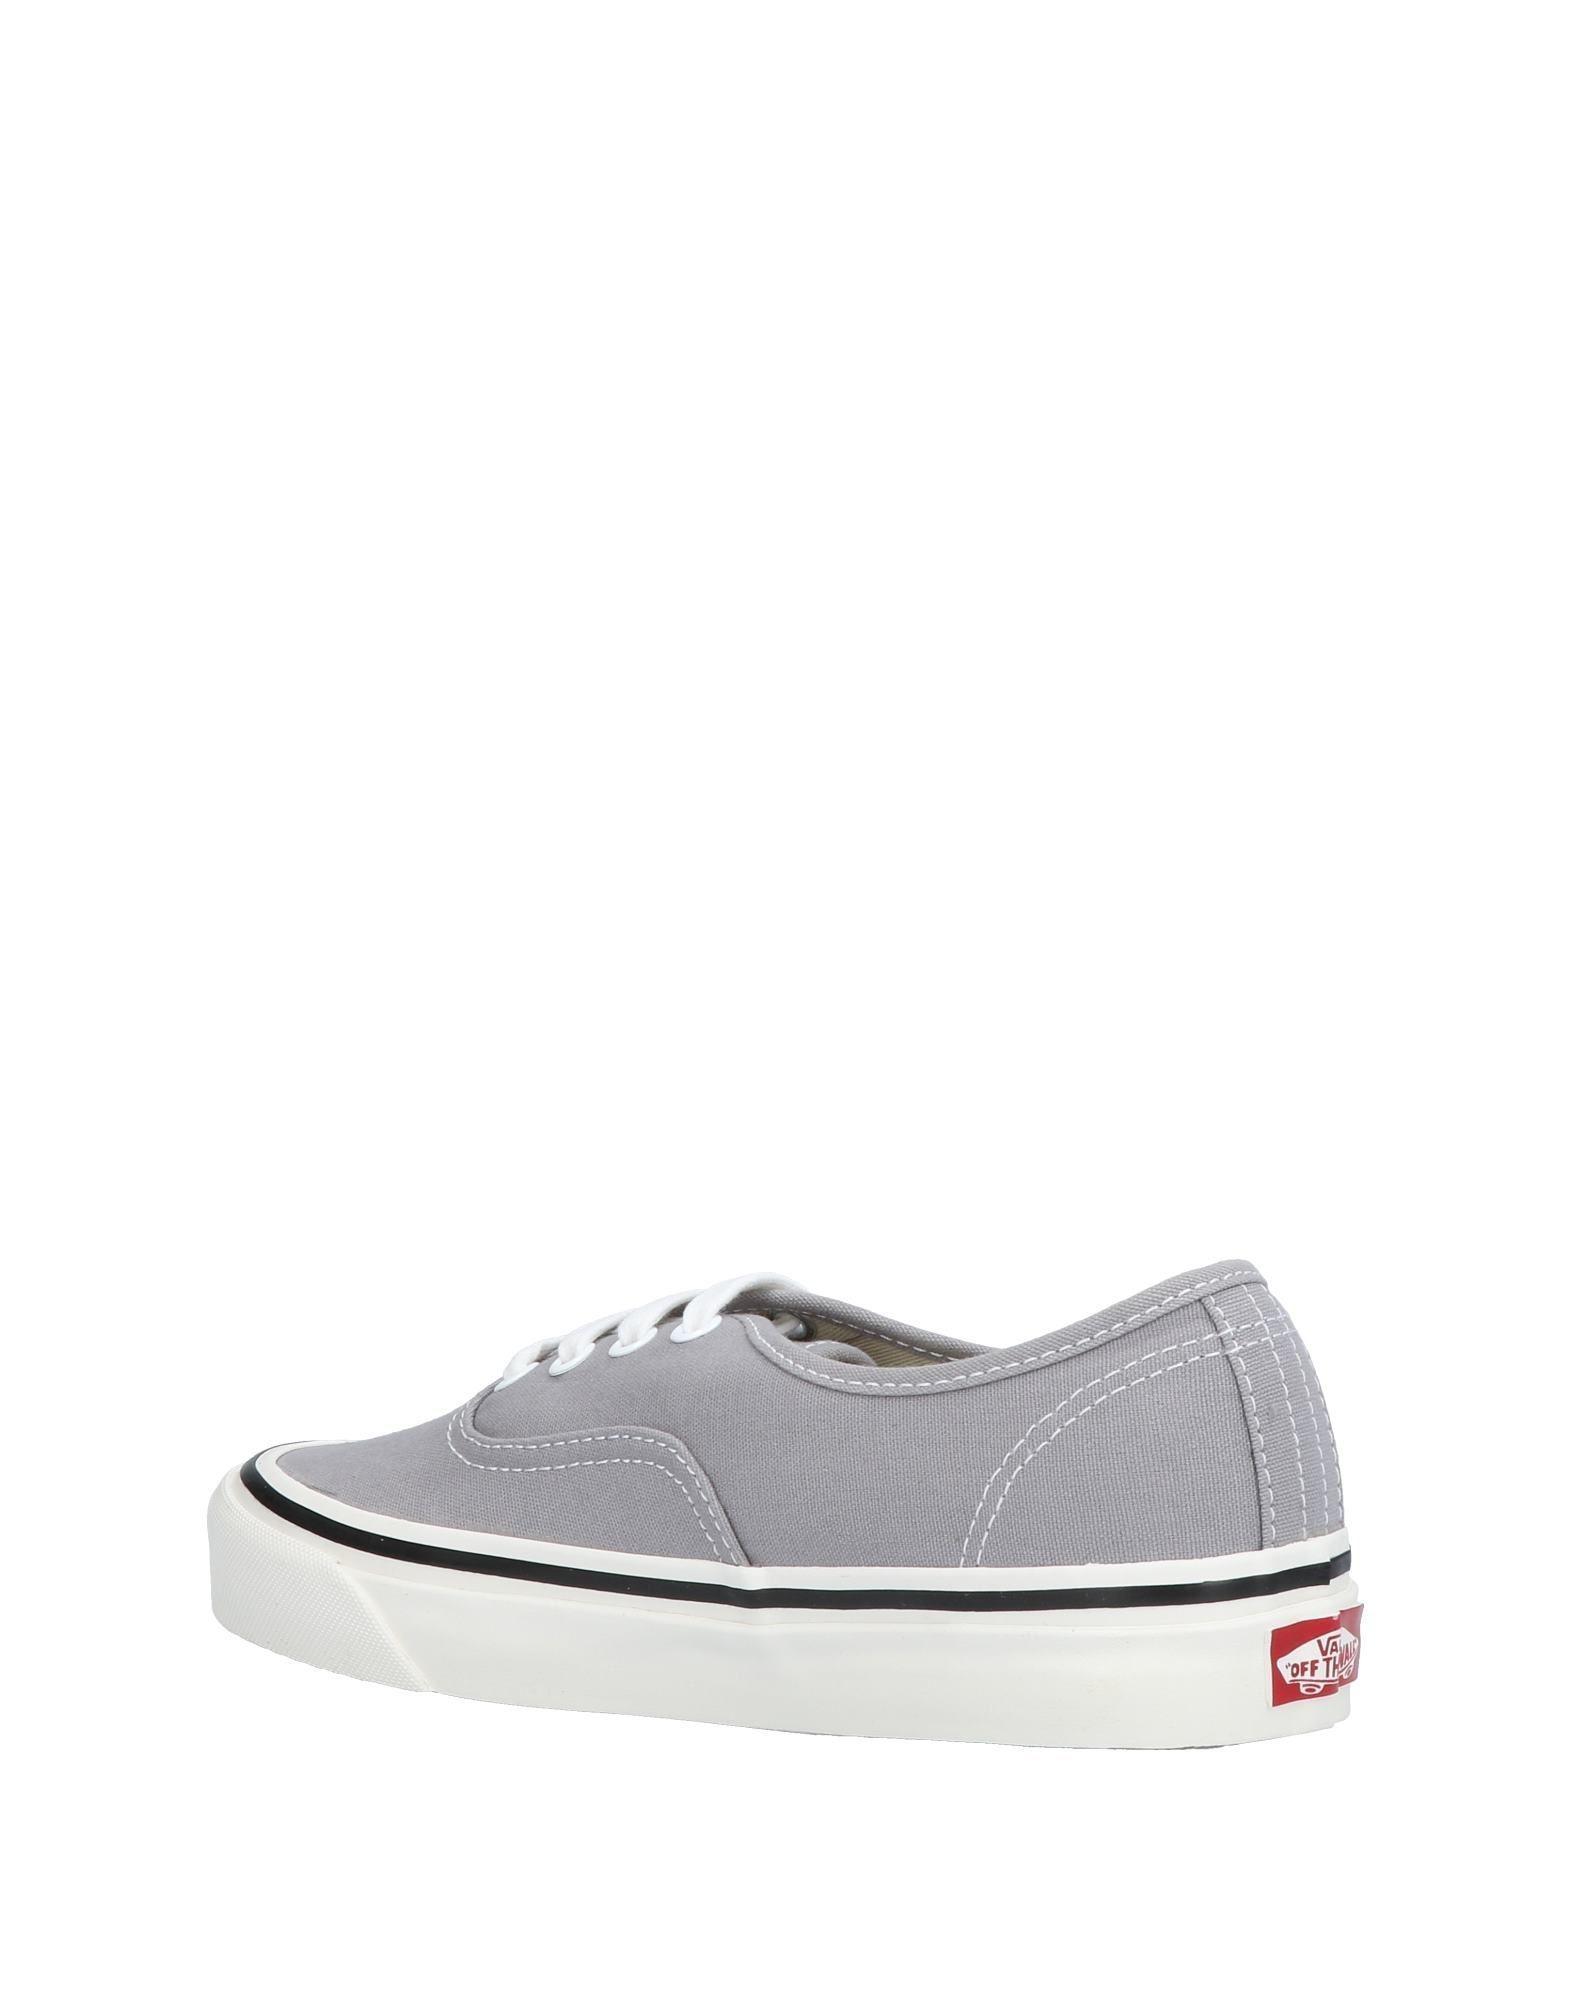 Vans Rubber Authentic 44 Dx Anaheim Factory Sneakers in Light Grey (Grey)